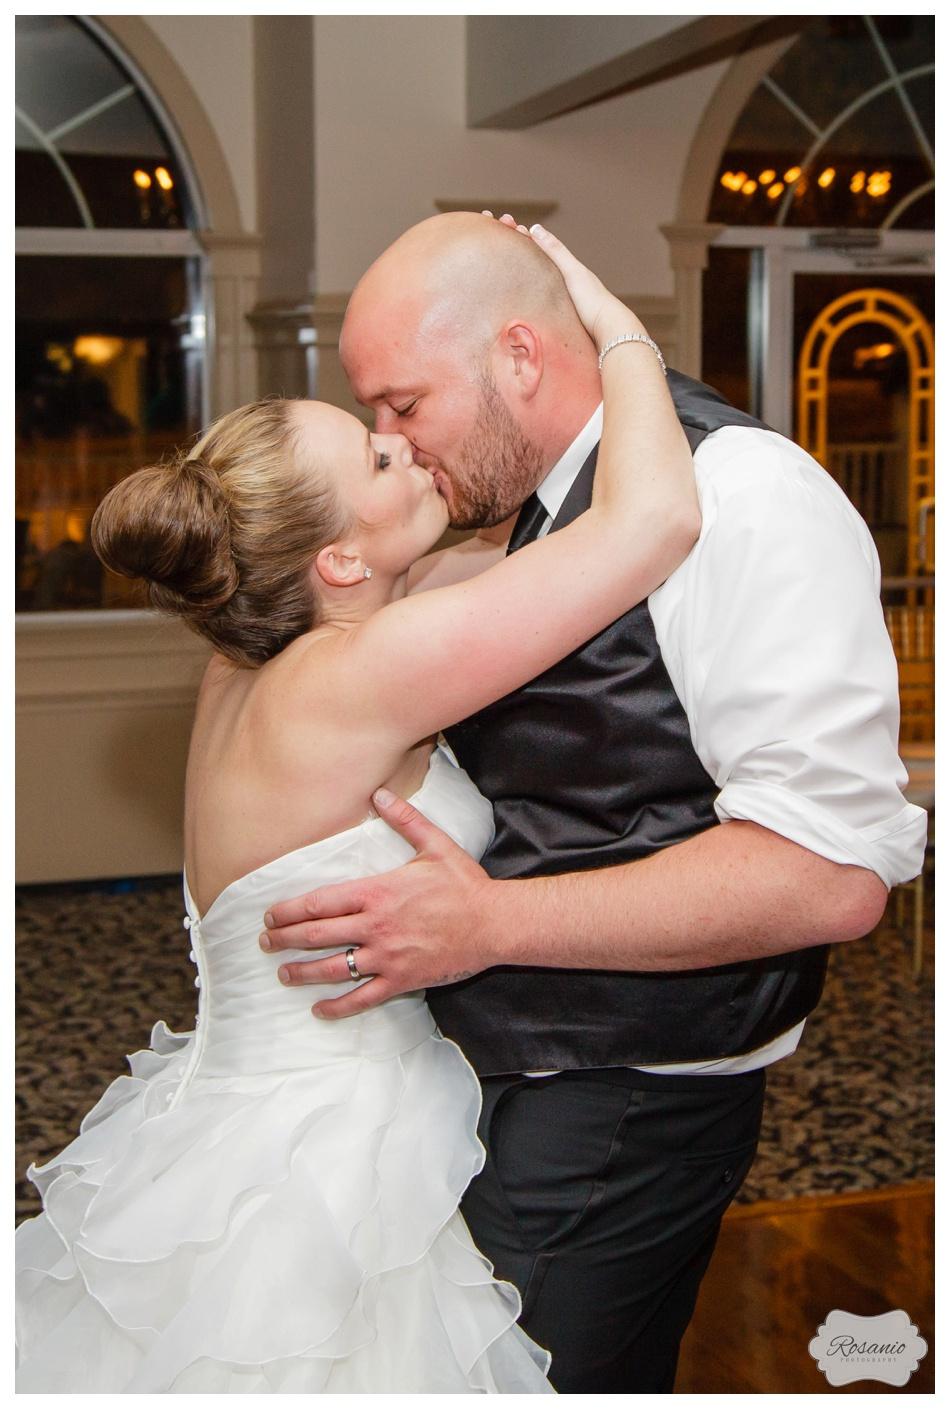 Rosanio Photography | Diburro's Haverhill MA | Massachusetts Wedding Photographer_0138.jpg